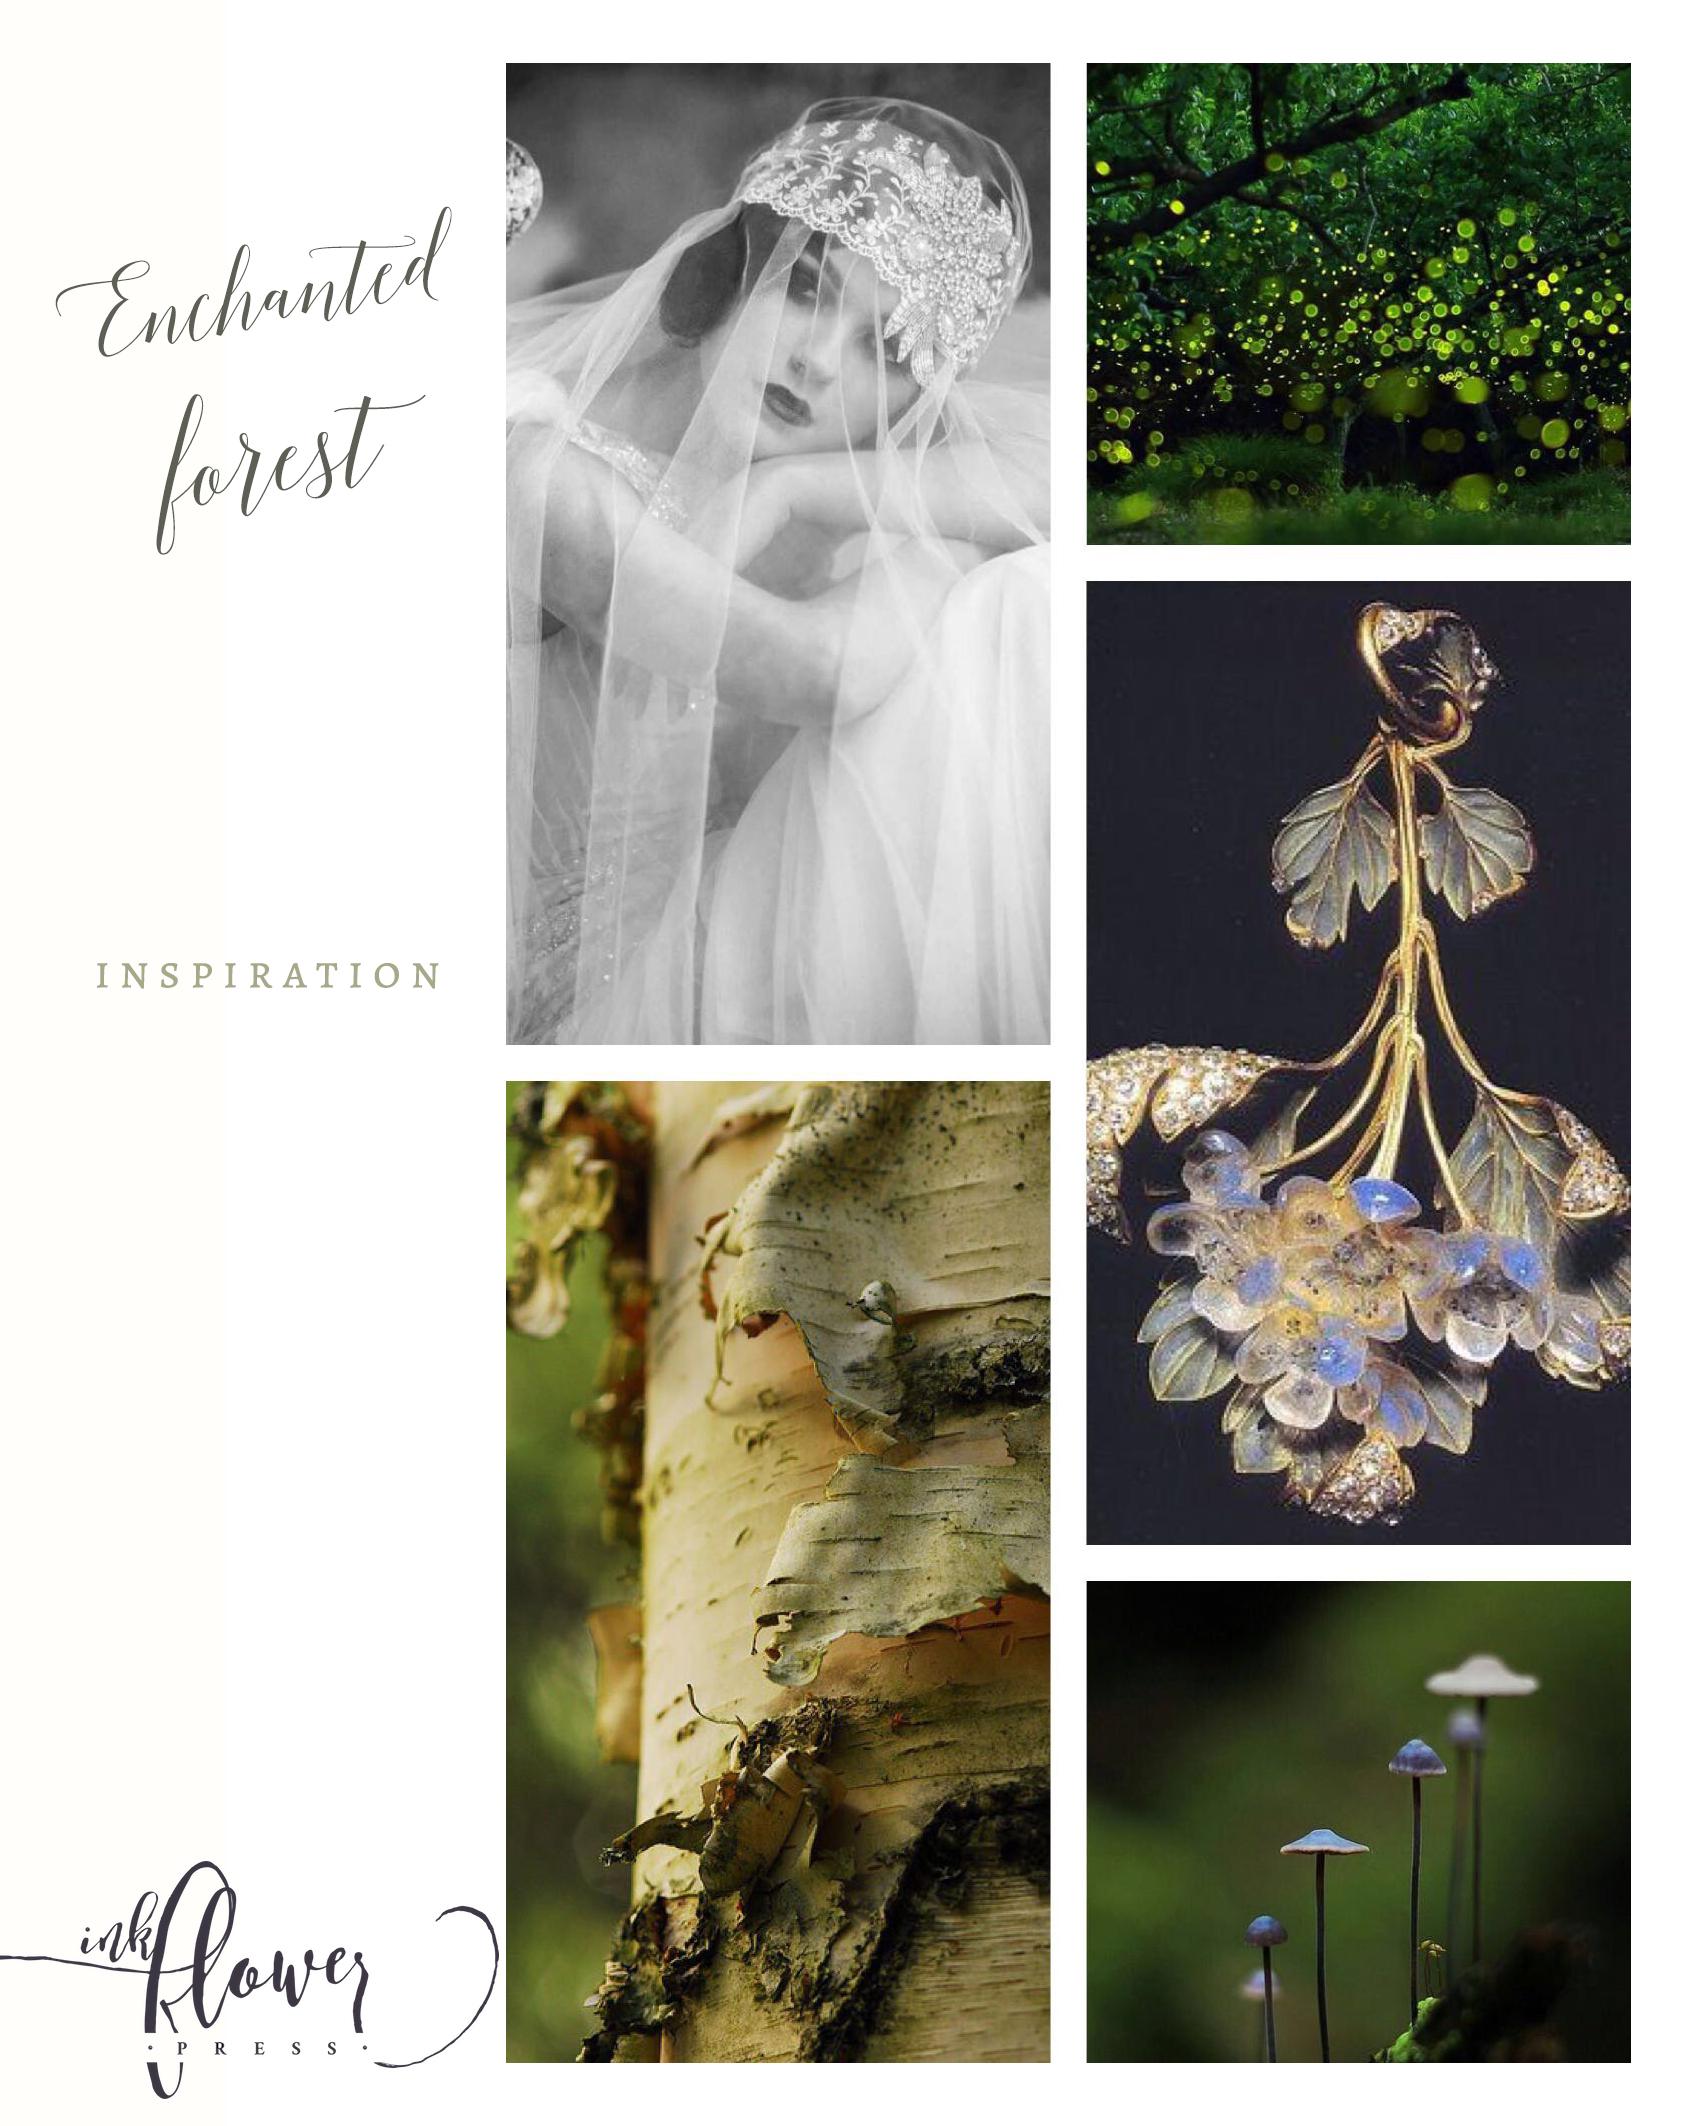 enchanted woodland insp.jpg